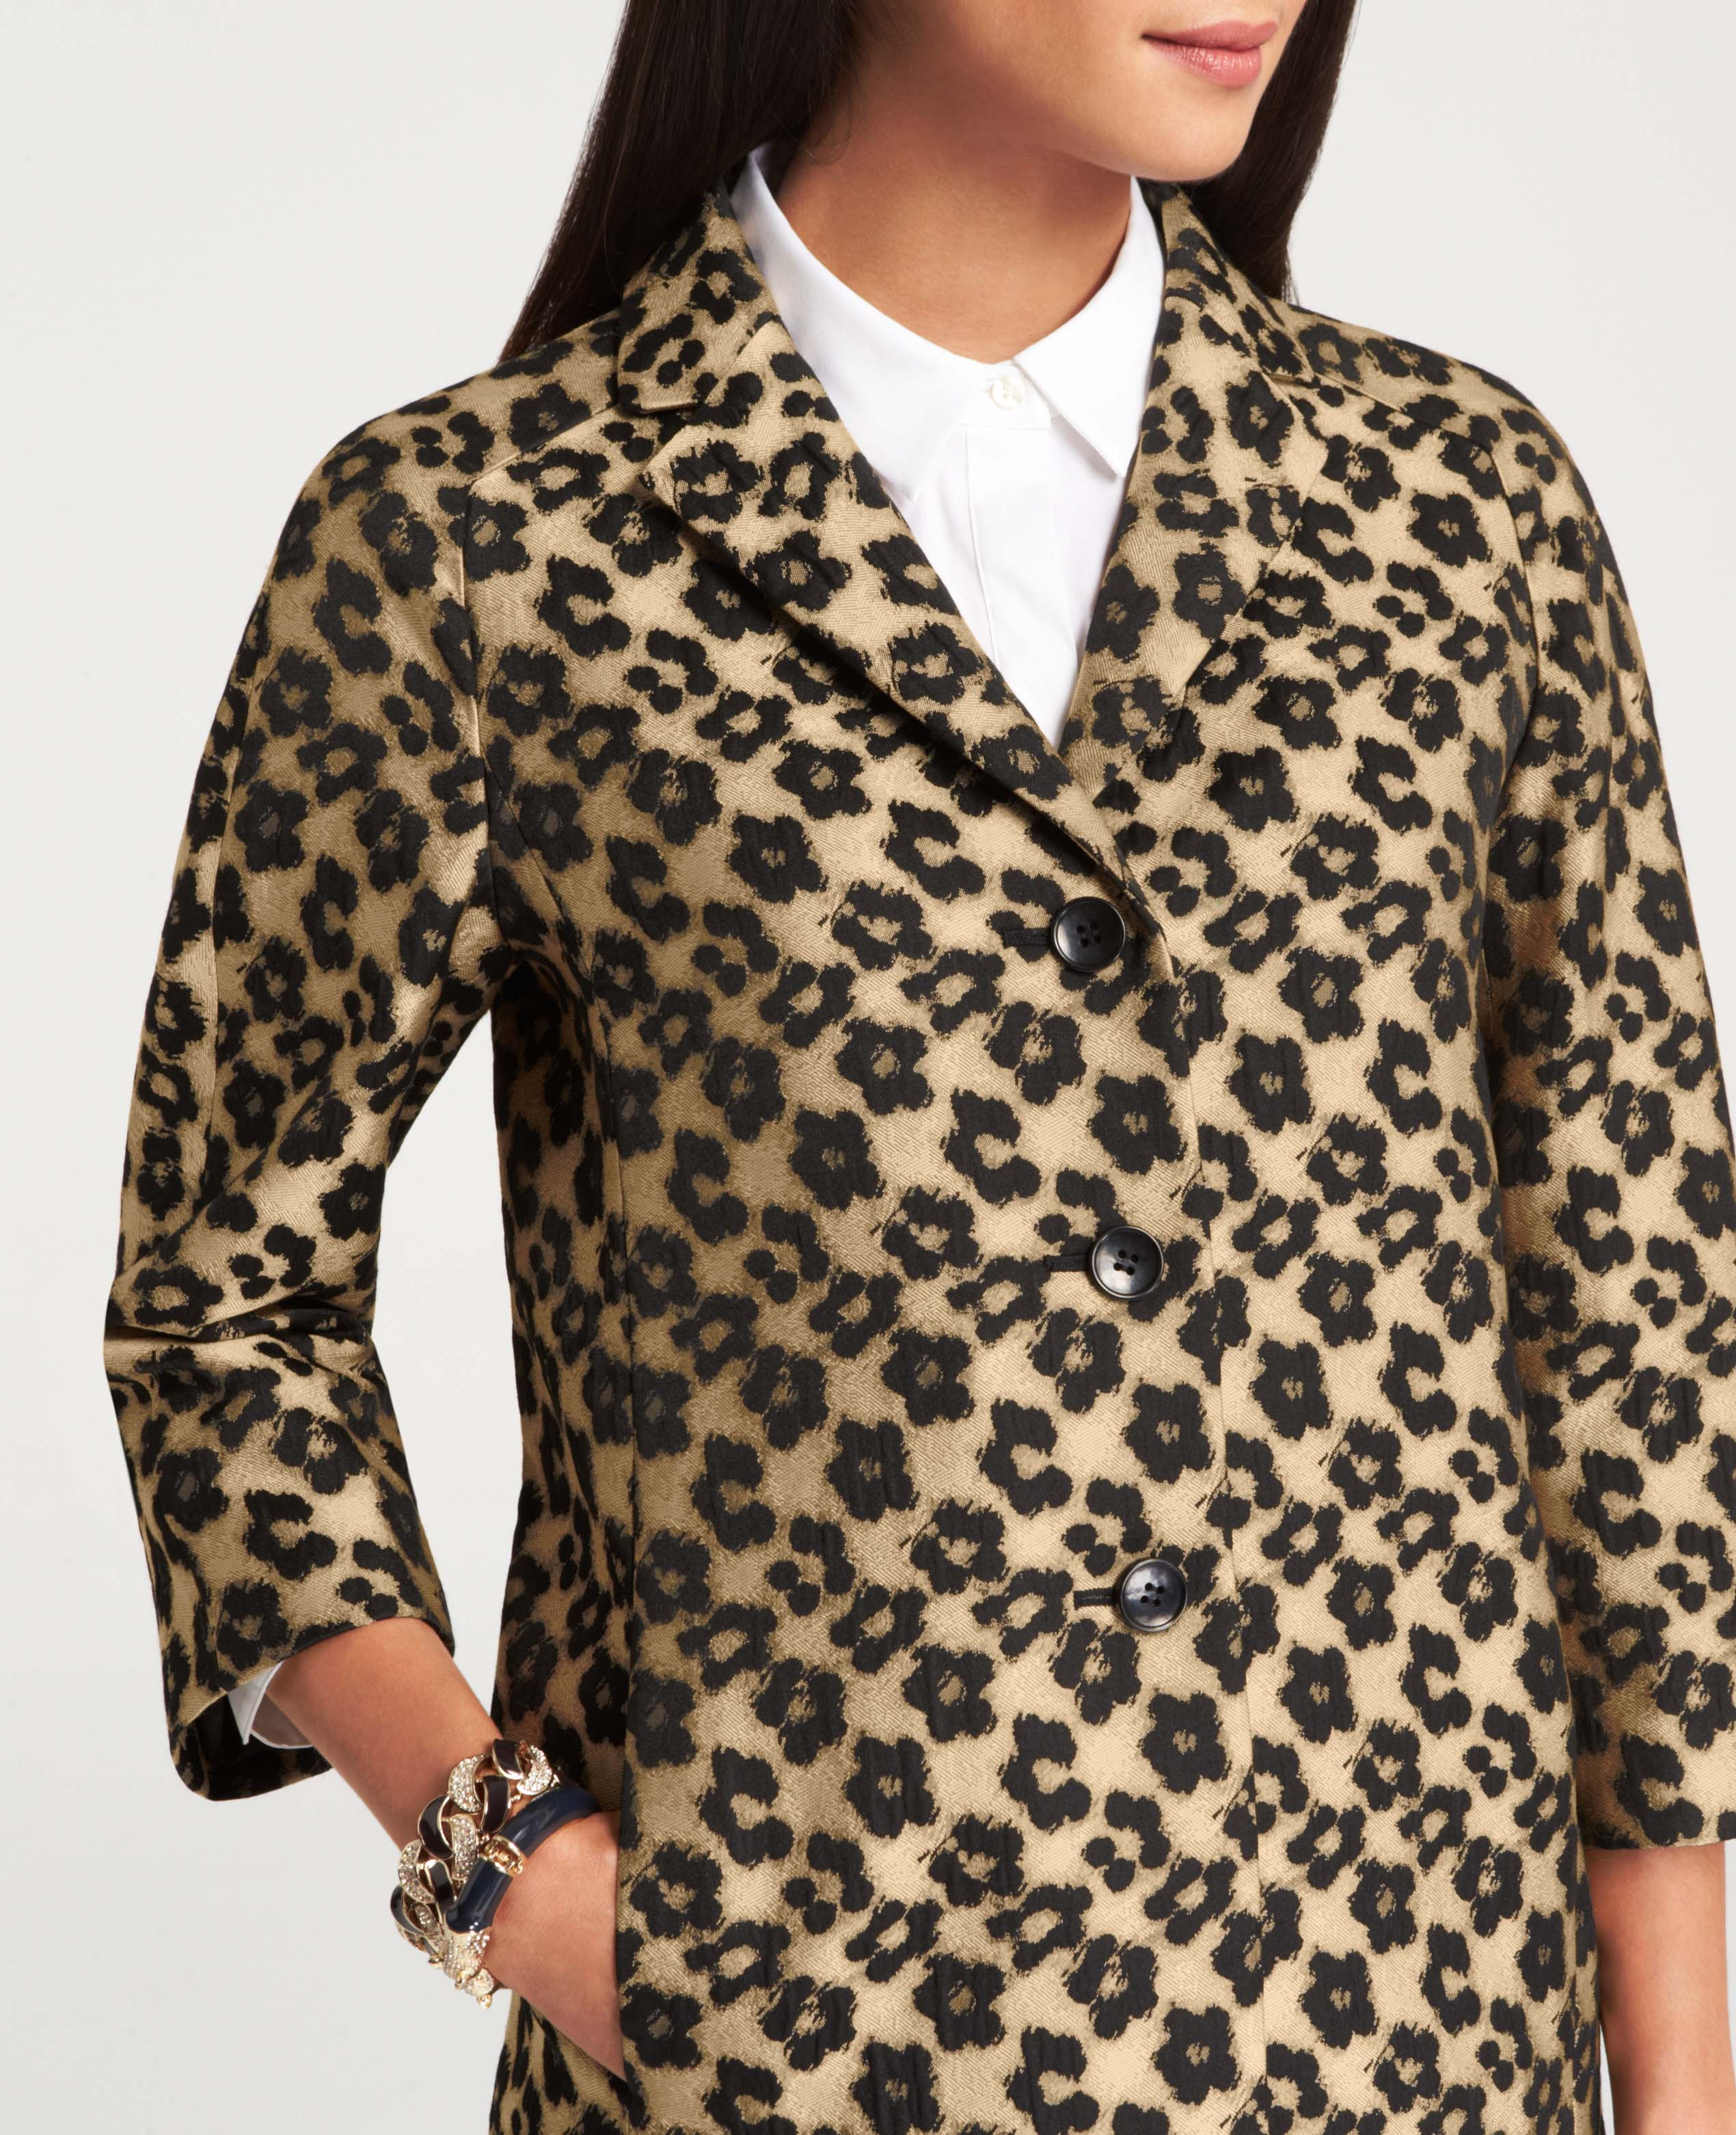 5db2232ed7cb Ann Taylor Floral Leopard Jacquard Topper in Natural - Lyst